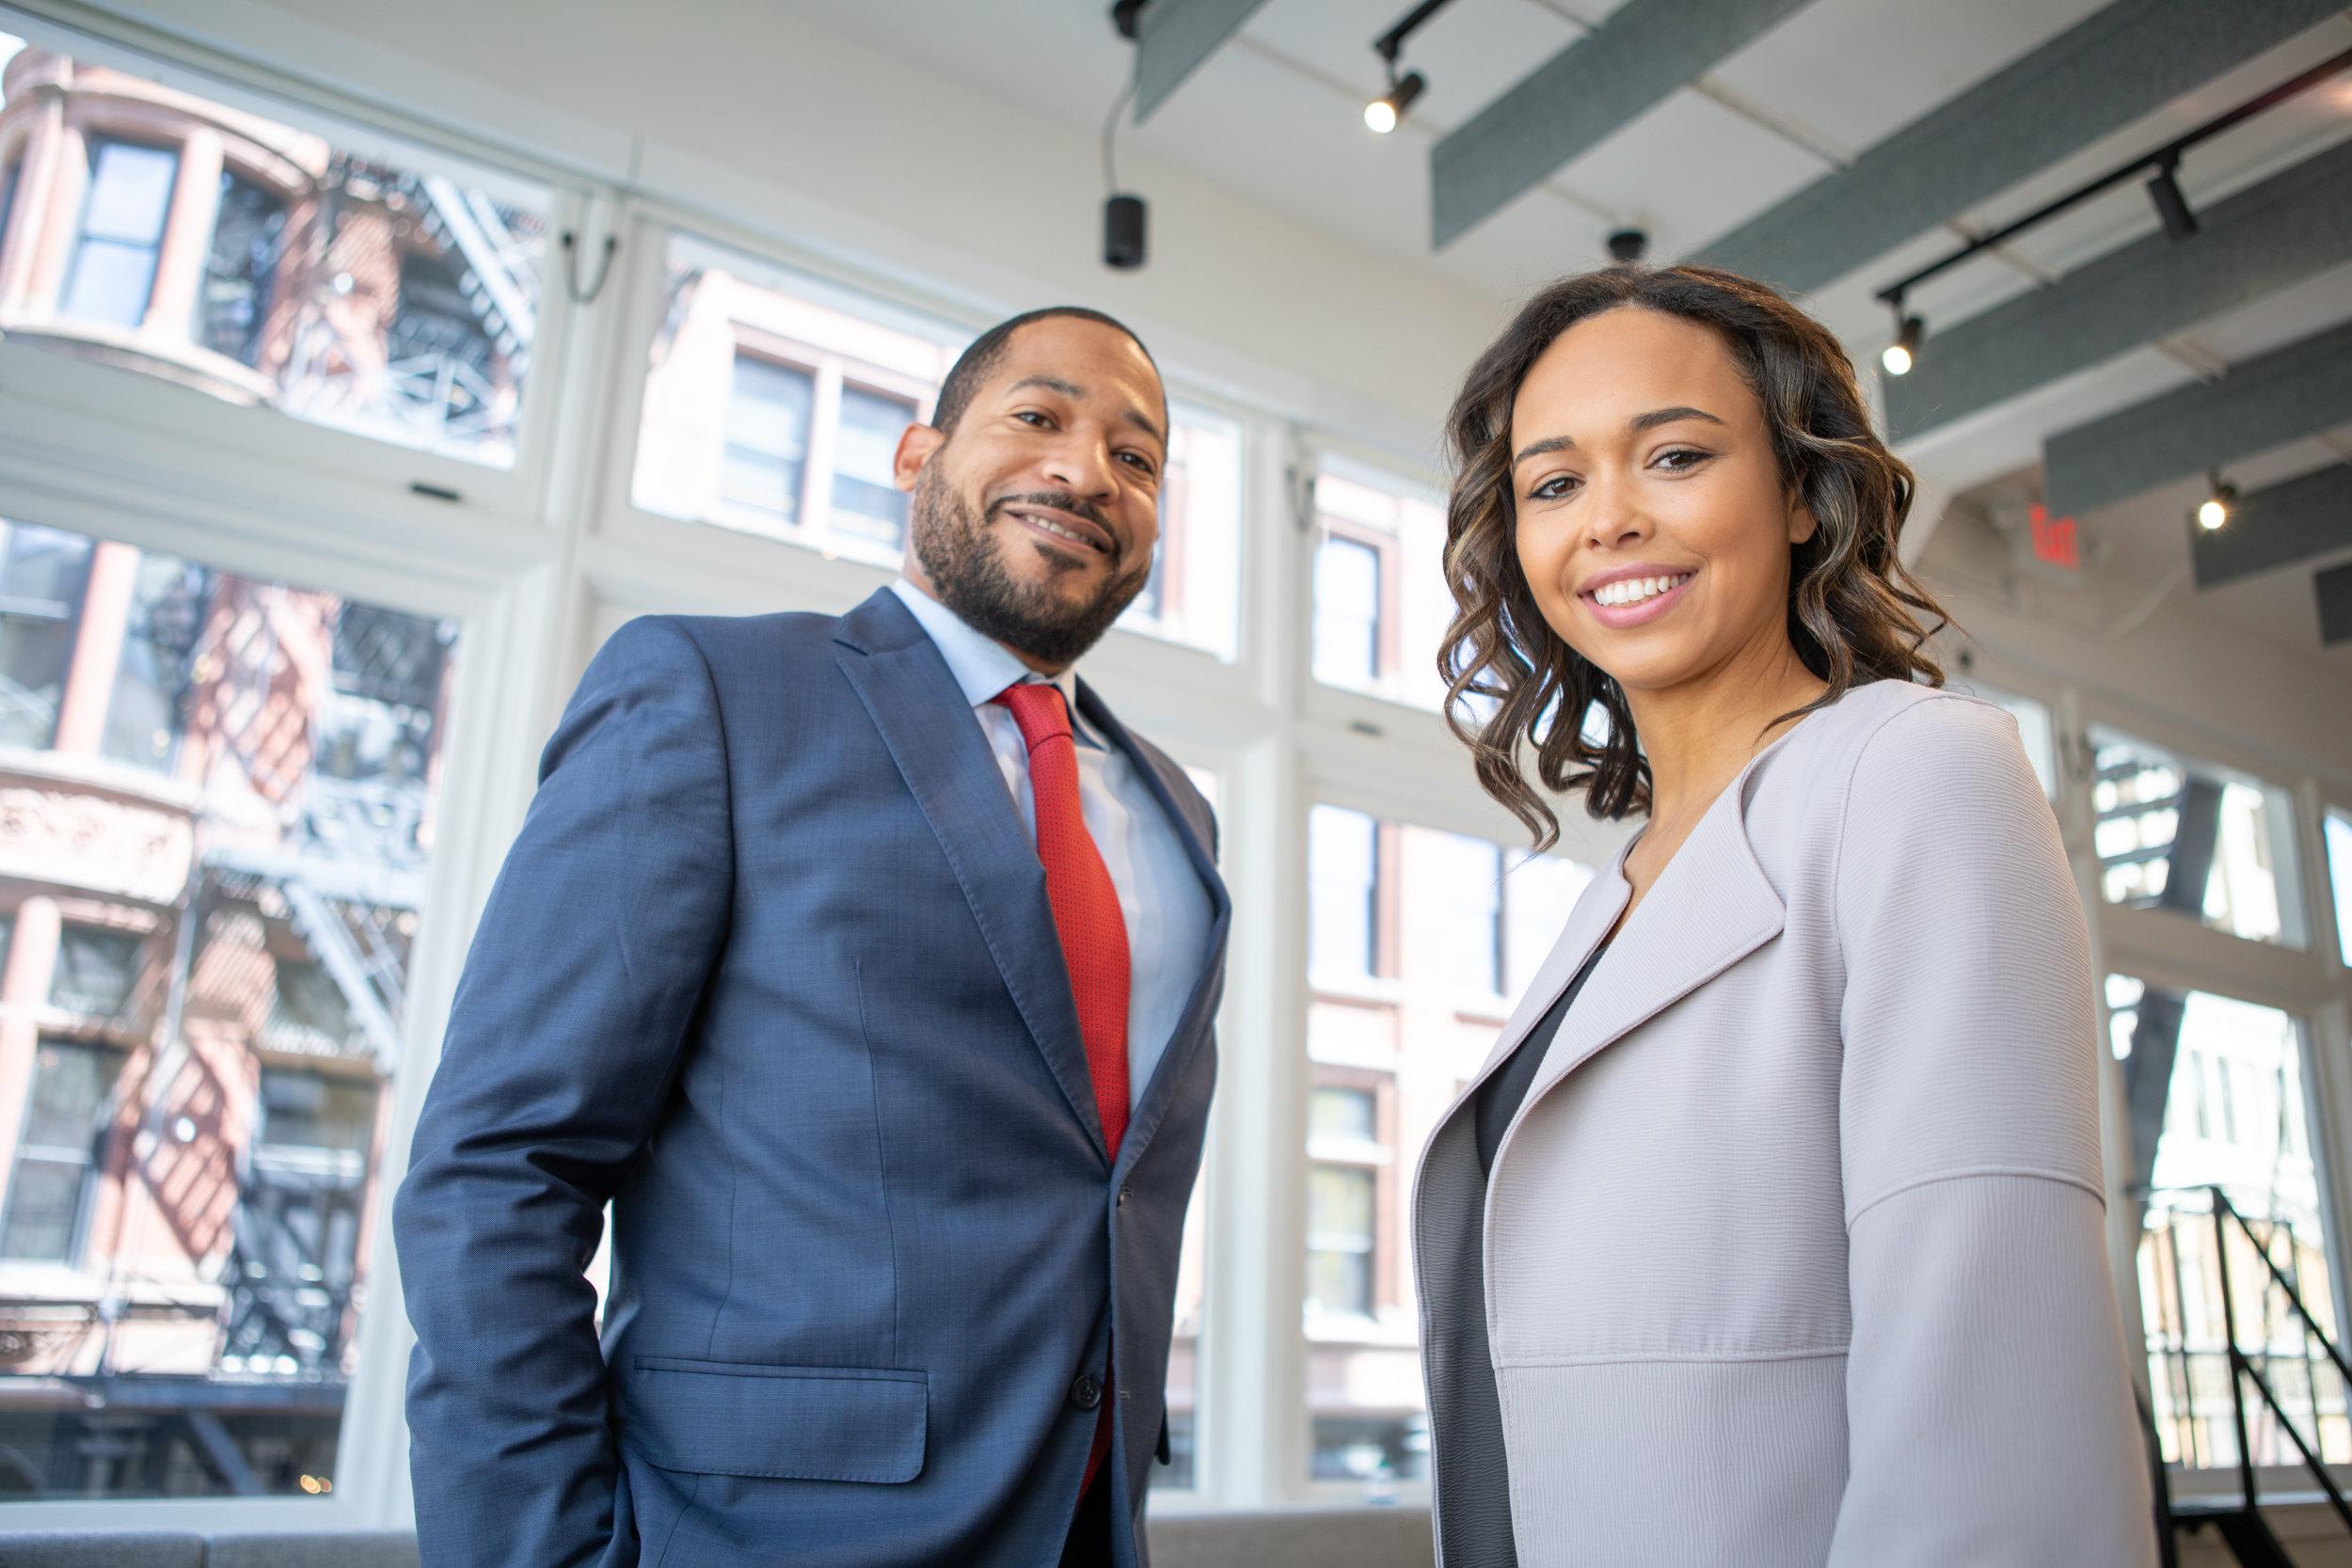 Job Seekers - Your Next Big Career Move.